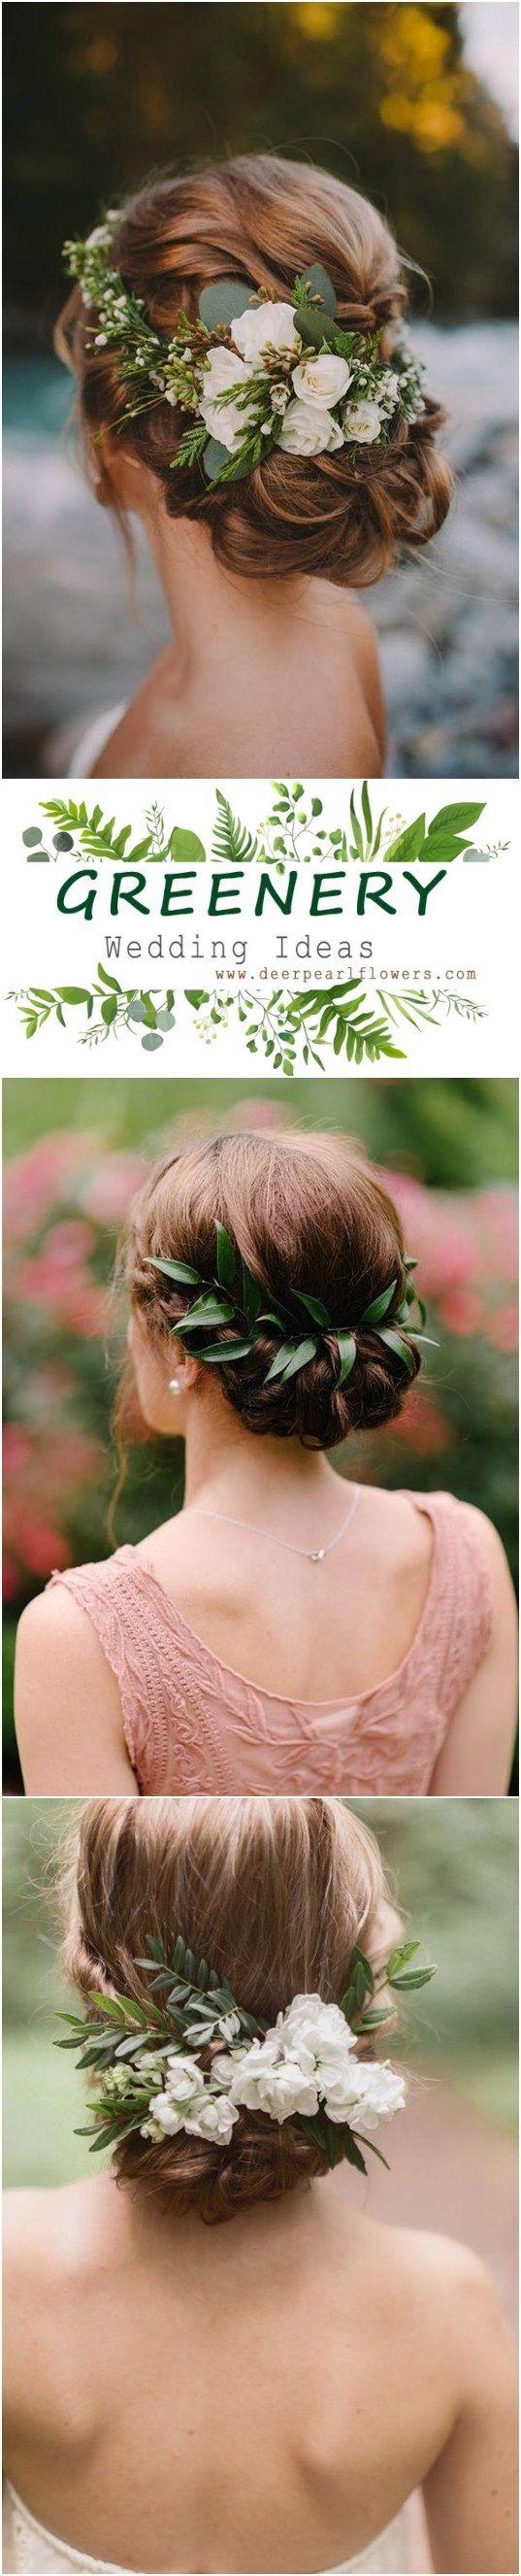 Greenery Rustic Wedding Hairstyle Ideas Green Wedding Weddingideas Dpf Deerpearlflowers R Rustic Wedding Hairstyles Rustic Bridesmaids Wedding Hairstyles